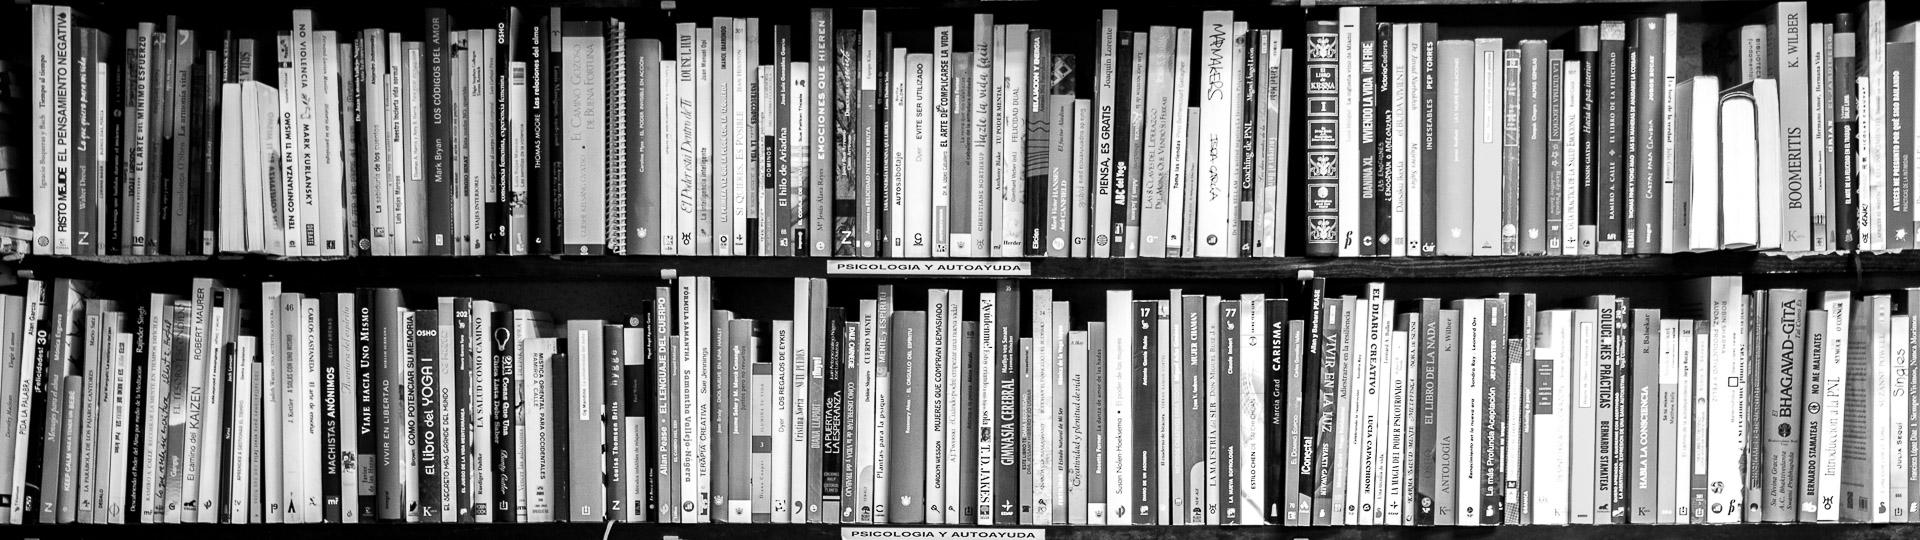 librerias-madrid-desvanlibro04fina.jpg